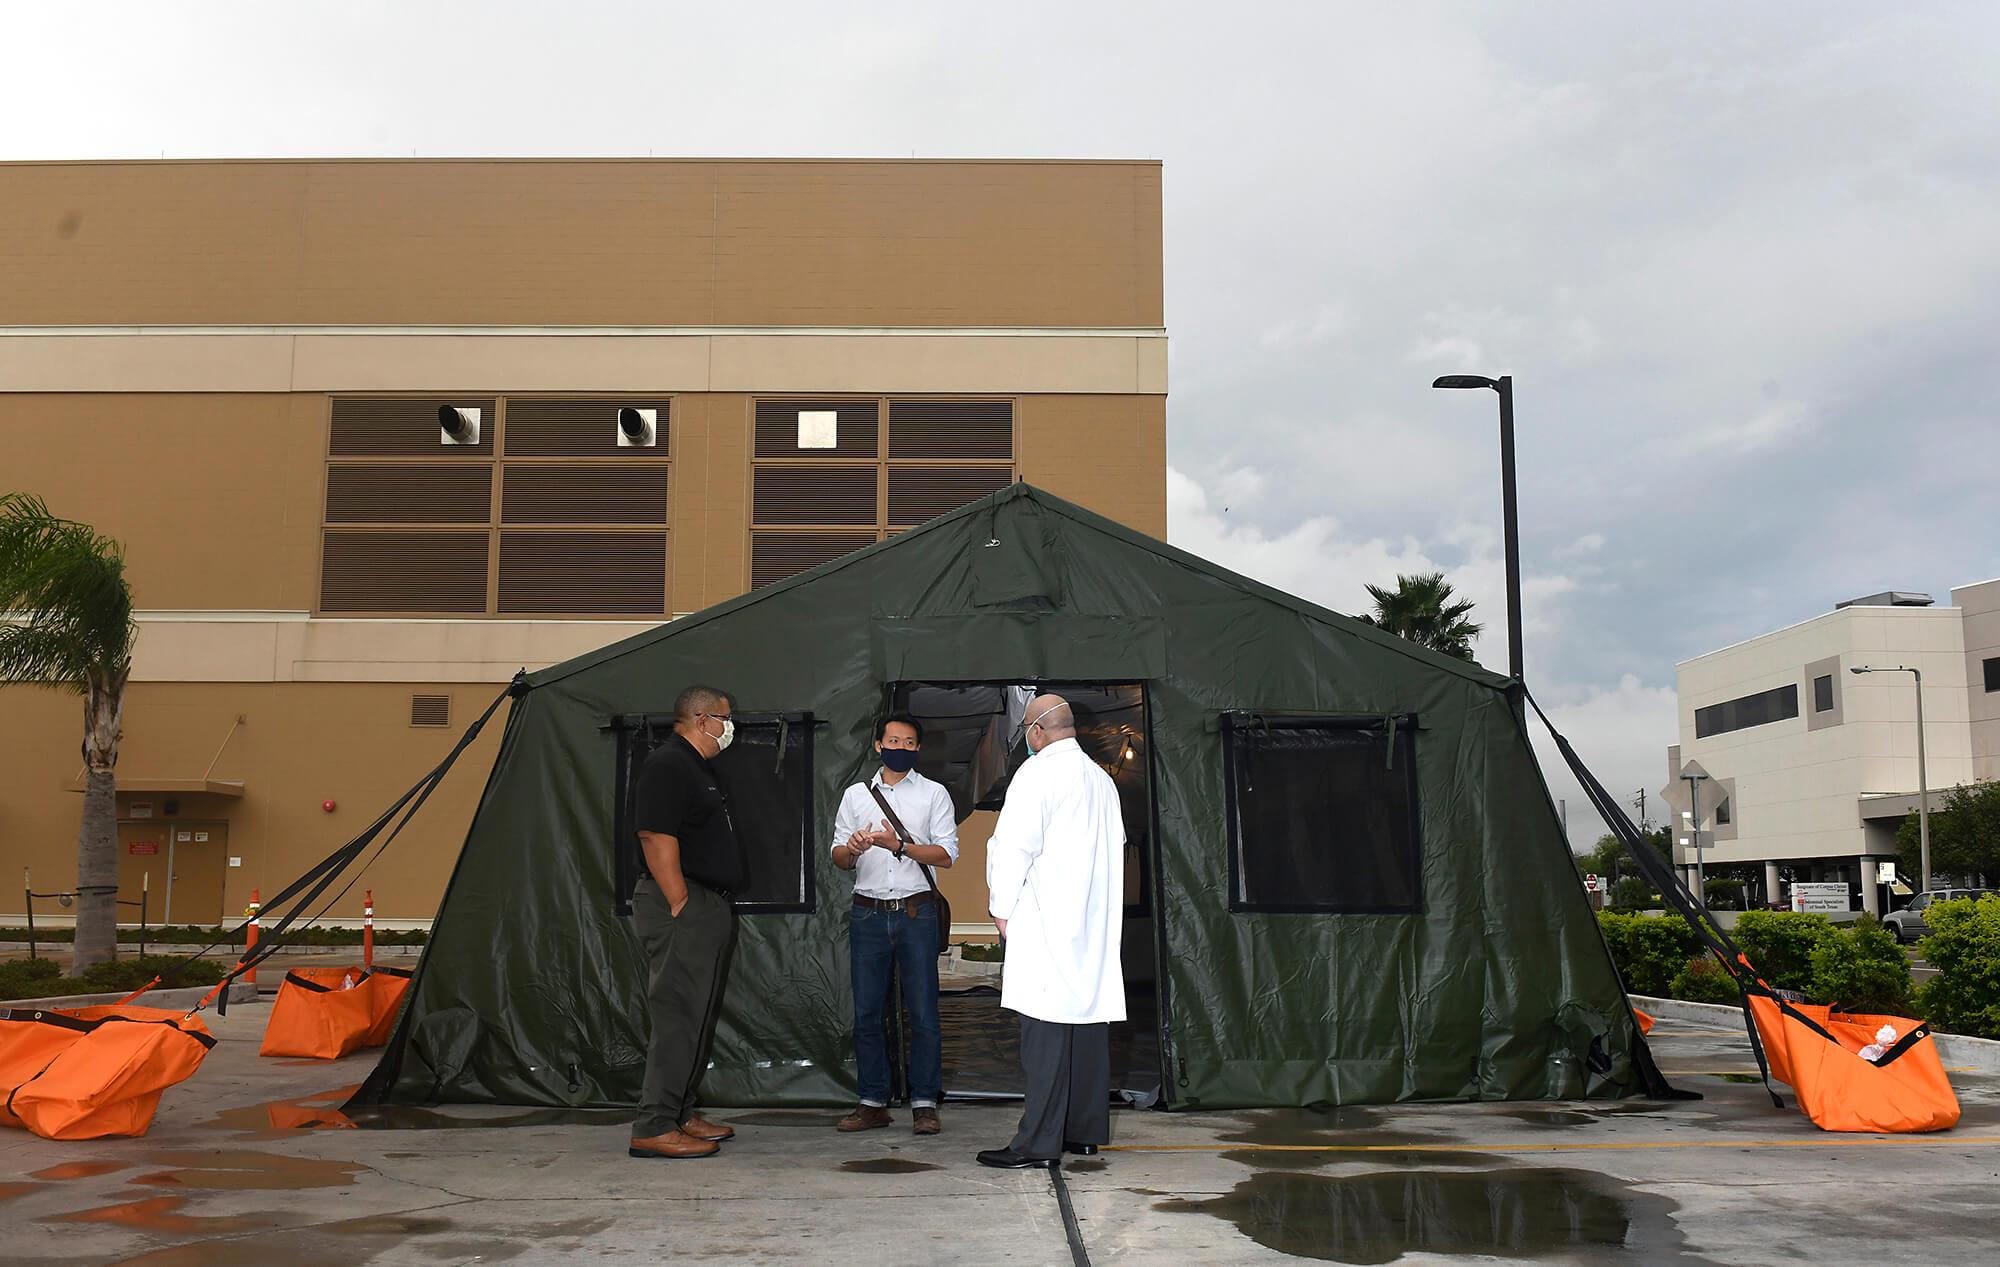 Photo courtesy Corpus Christi Caller-Times/Annie Rice photographer Walkthrough of an emergency field unit at Spohn Shoreline in Corpus Christi, Texas.